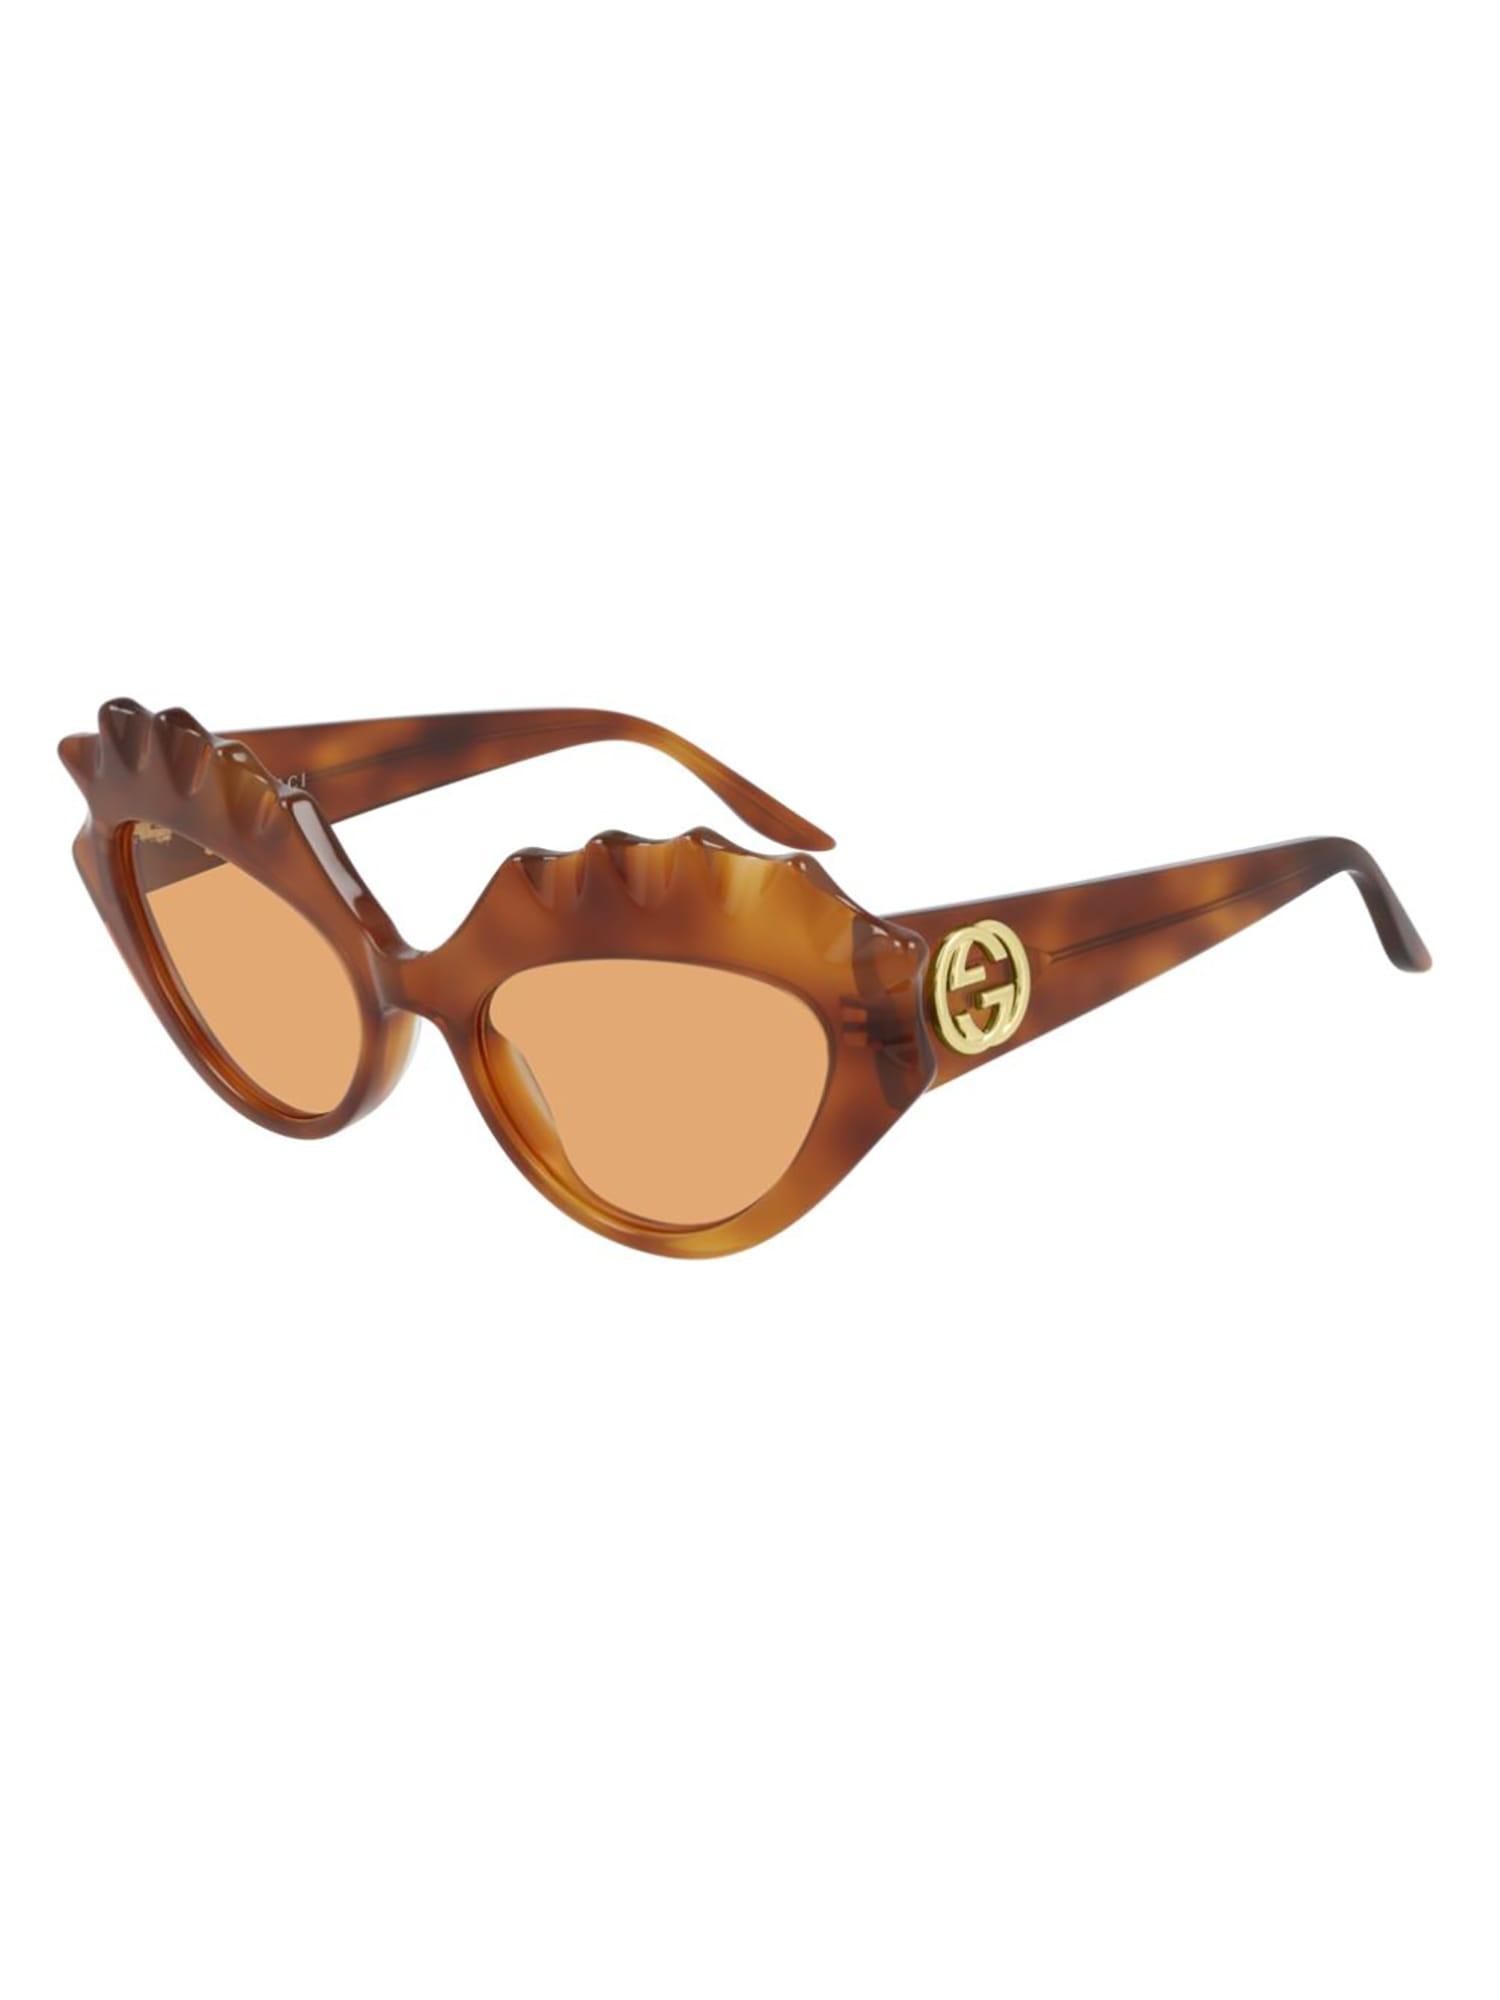 Gucci Gg0781s Sunglasses In Havana Havana Orange